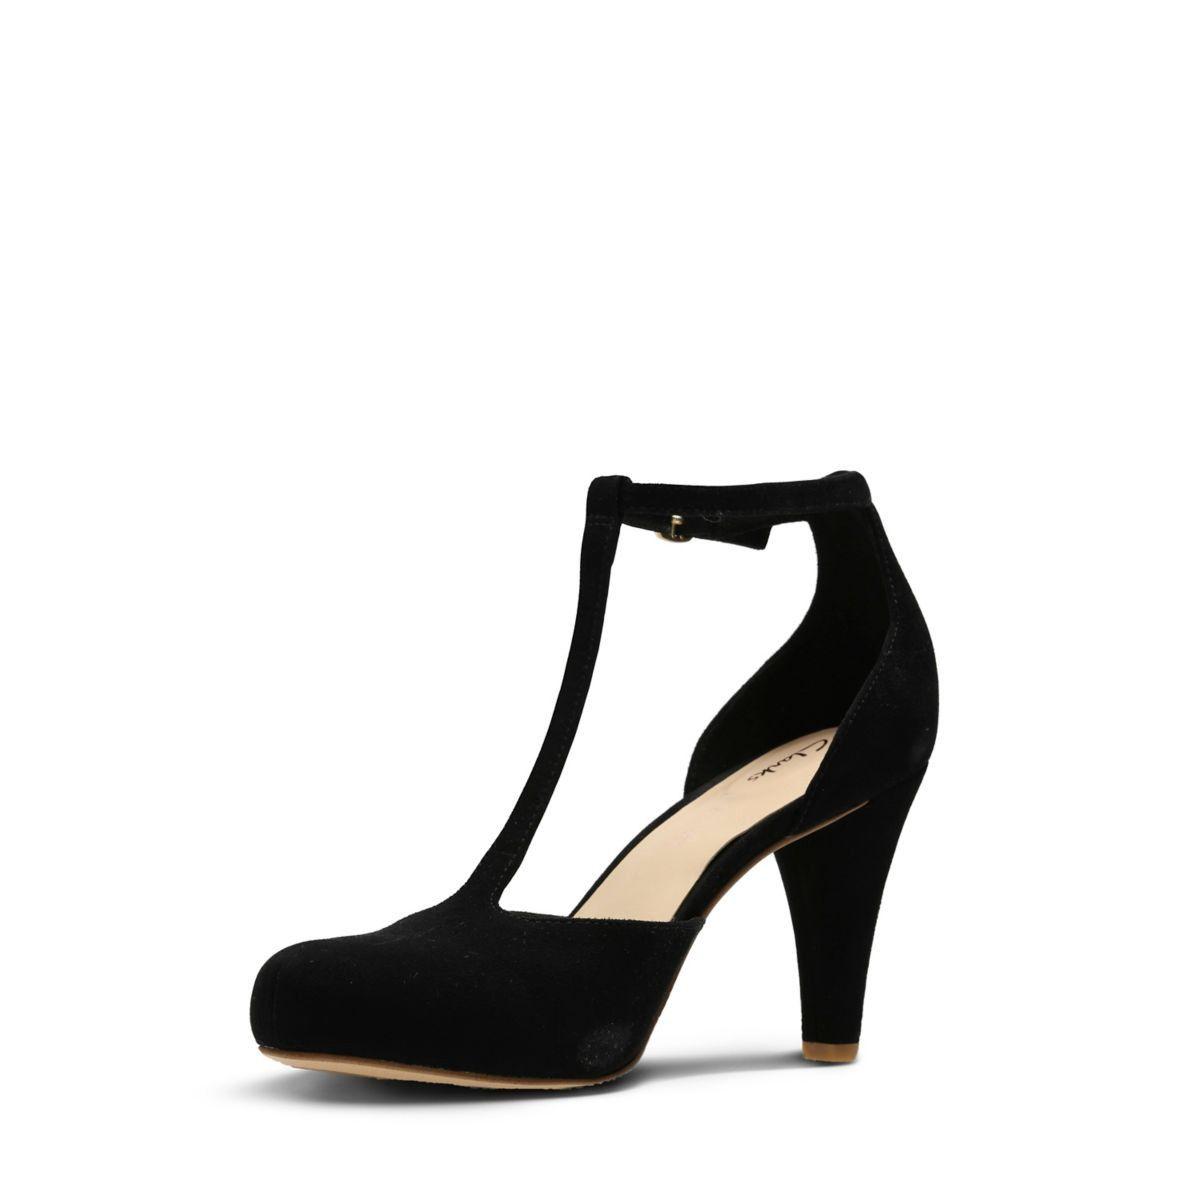 e6002f84ca1f Clarks Dalia Tulip - Womens Shoes Black Suede 7.5 D (Medium ...